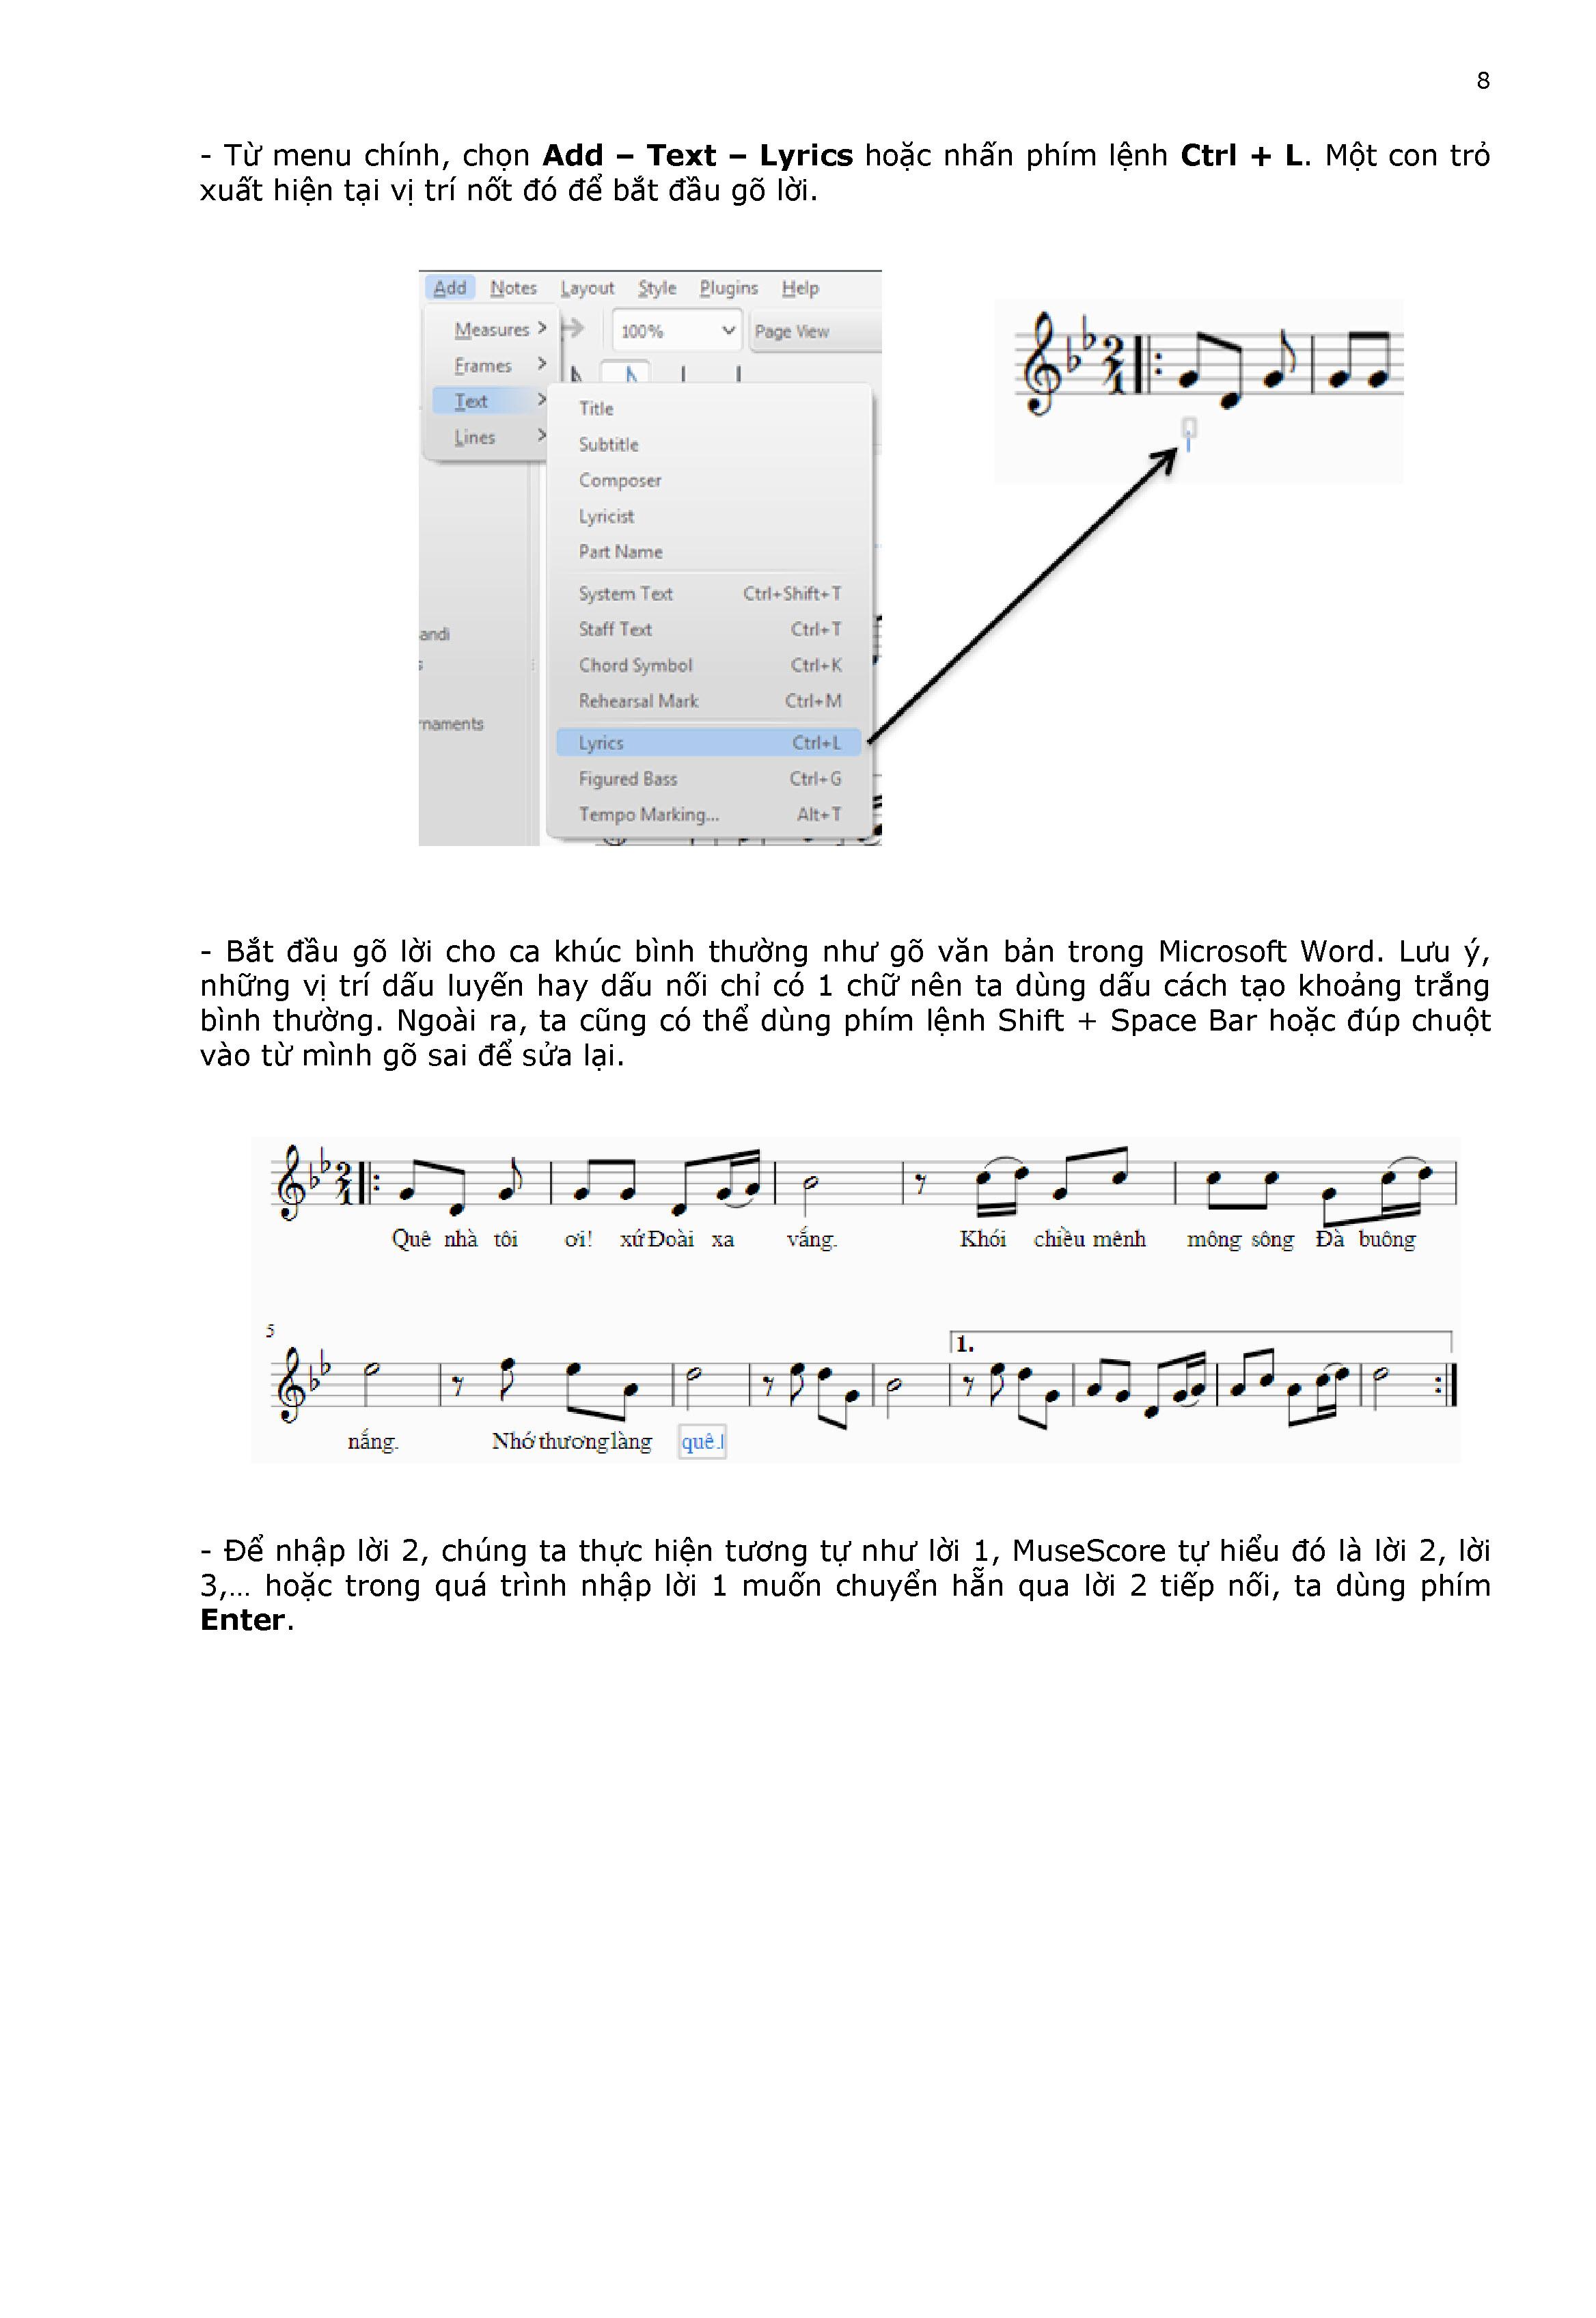 MuseScore-Huong Dan Chep Ca Khuc-8.jpg